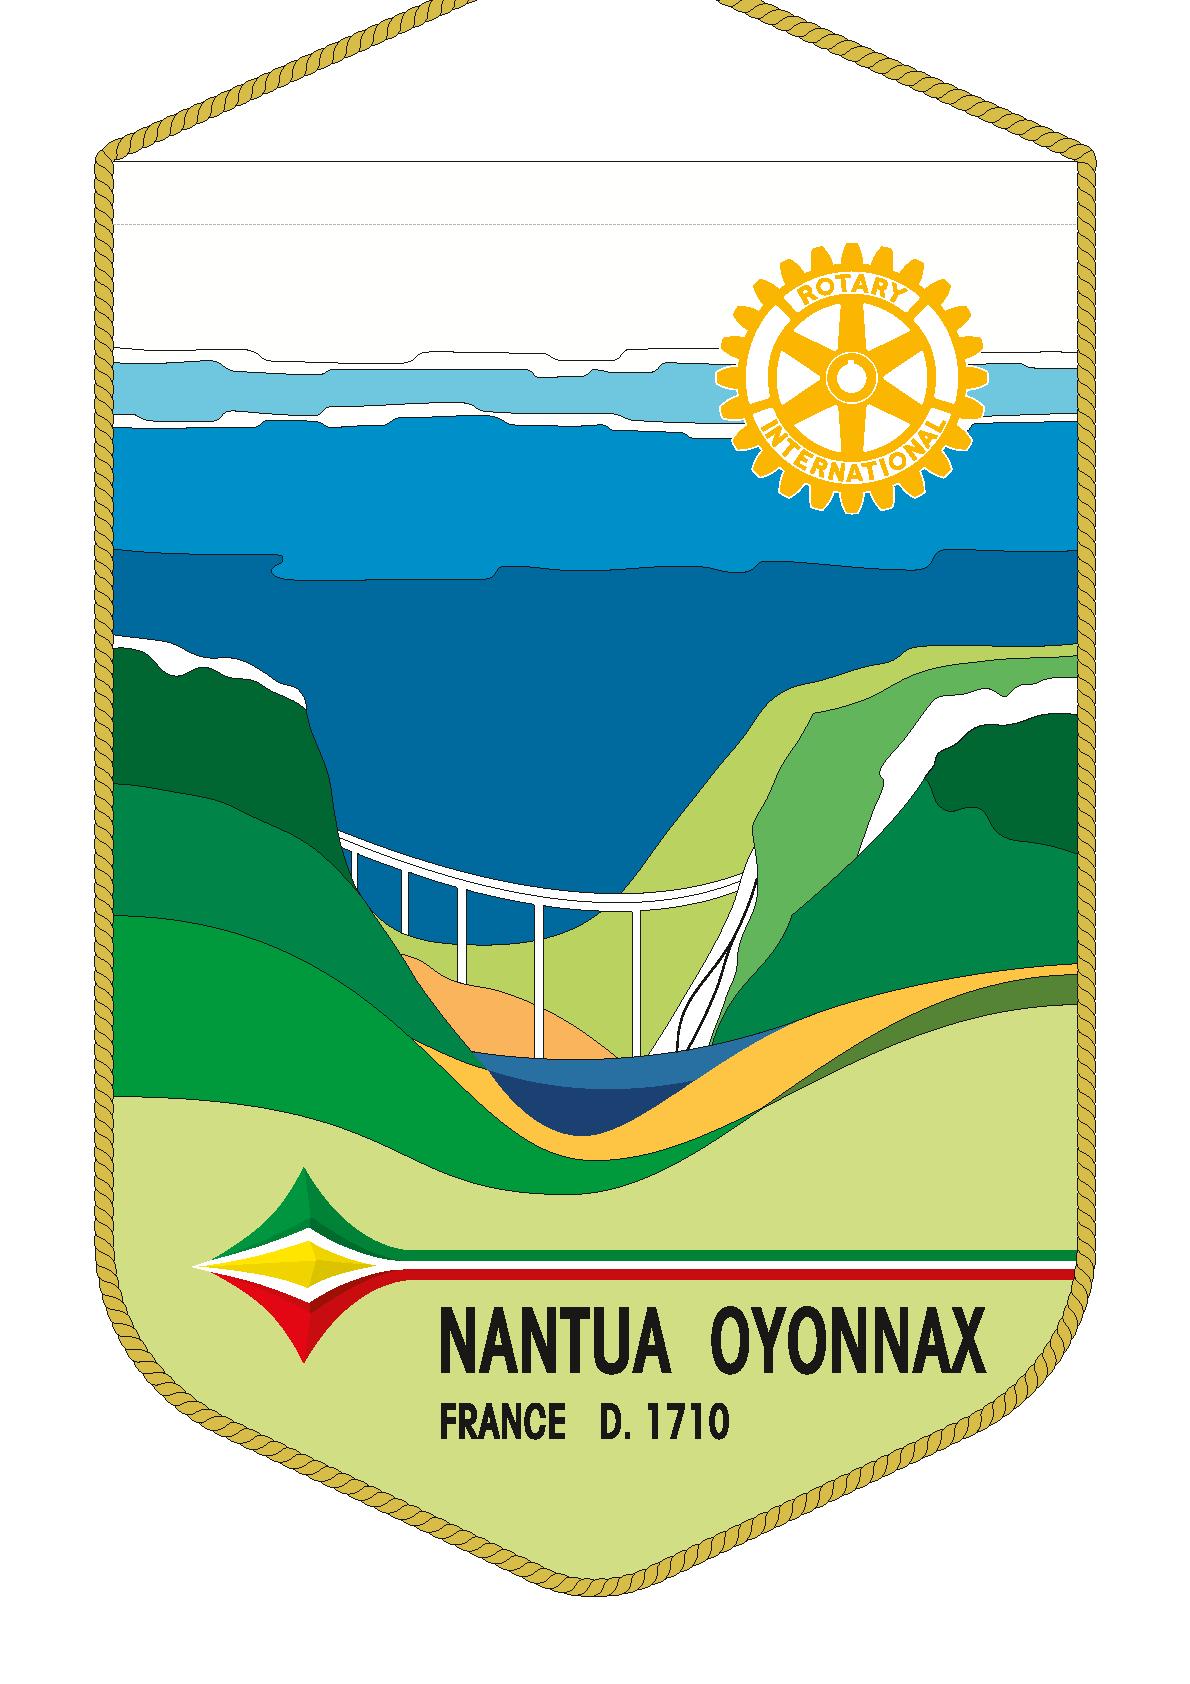 FANION ROTARY CLUB NANTUA OYONNAX